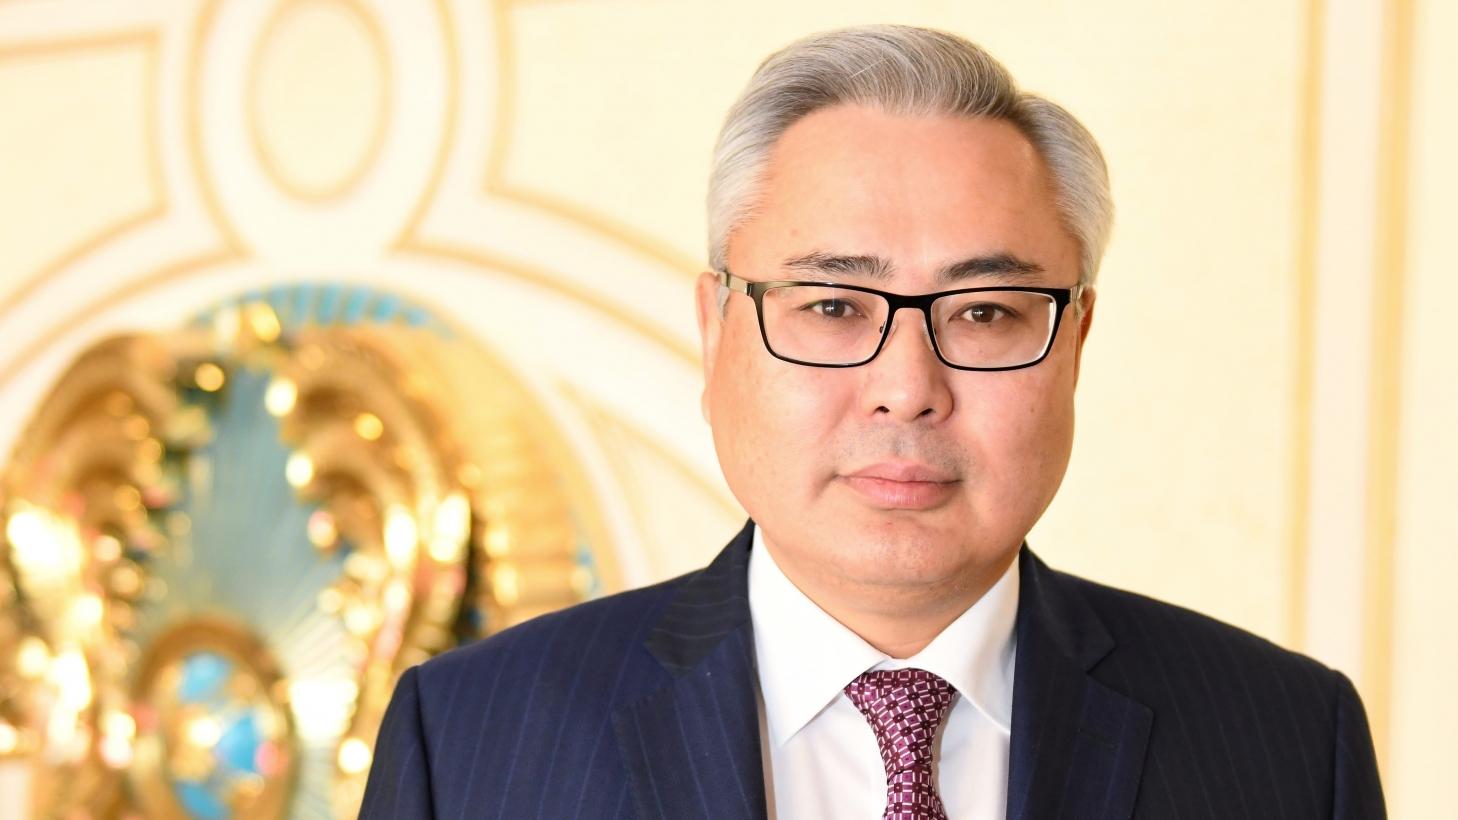 Галымжан Койшыбаев возглавил канцелярию премьер-министра РК